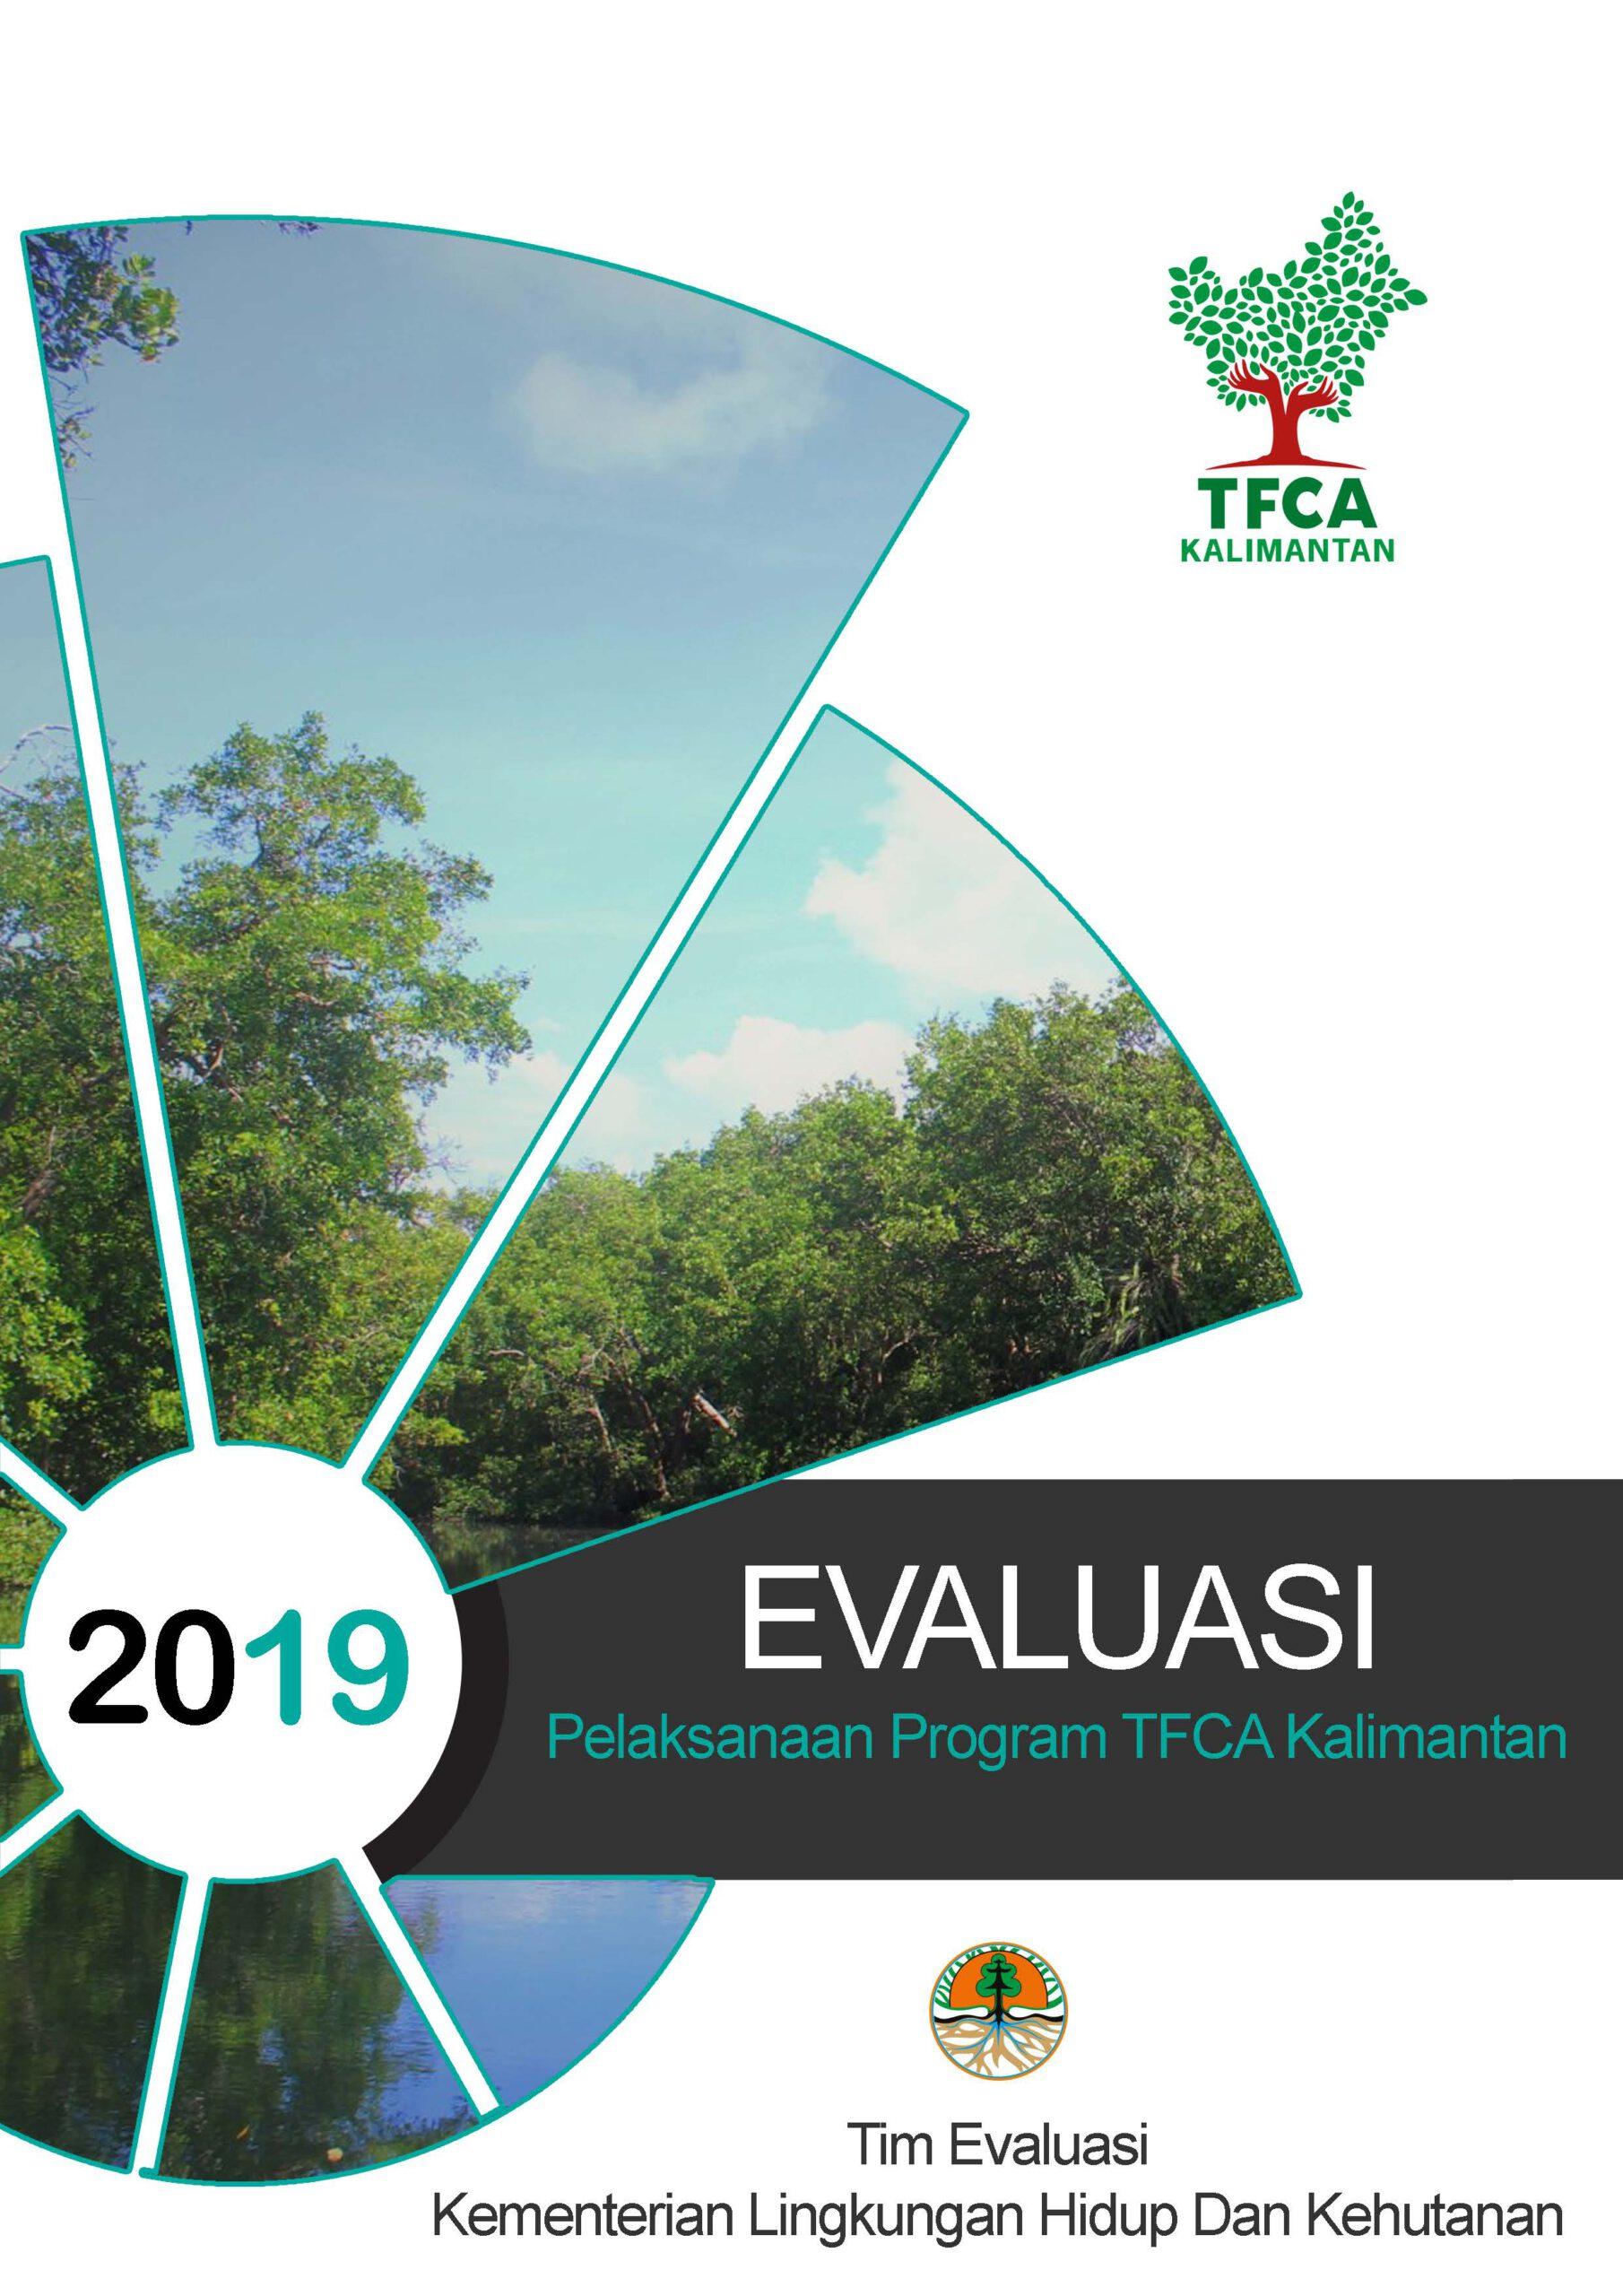 EVALUASI Pelaksanaan Program TFCA Kalimantan